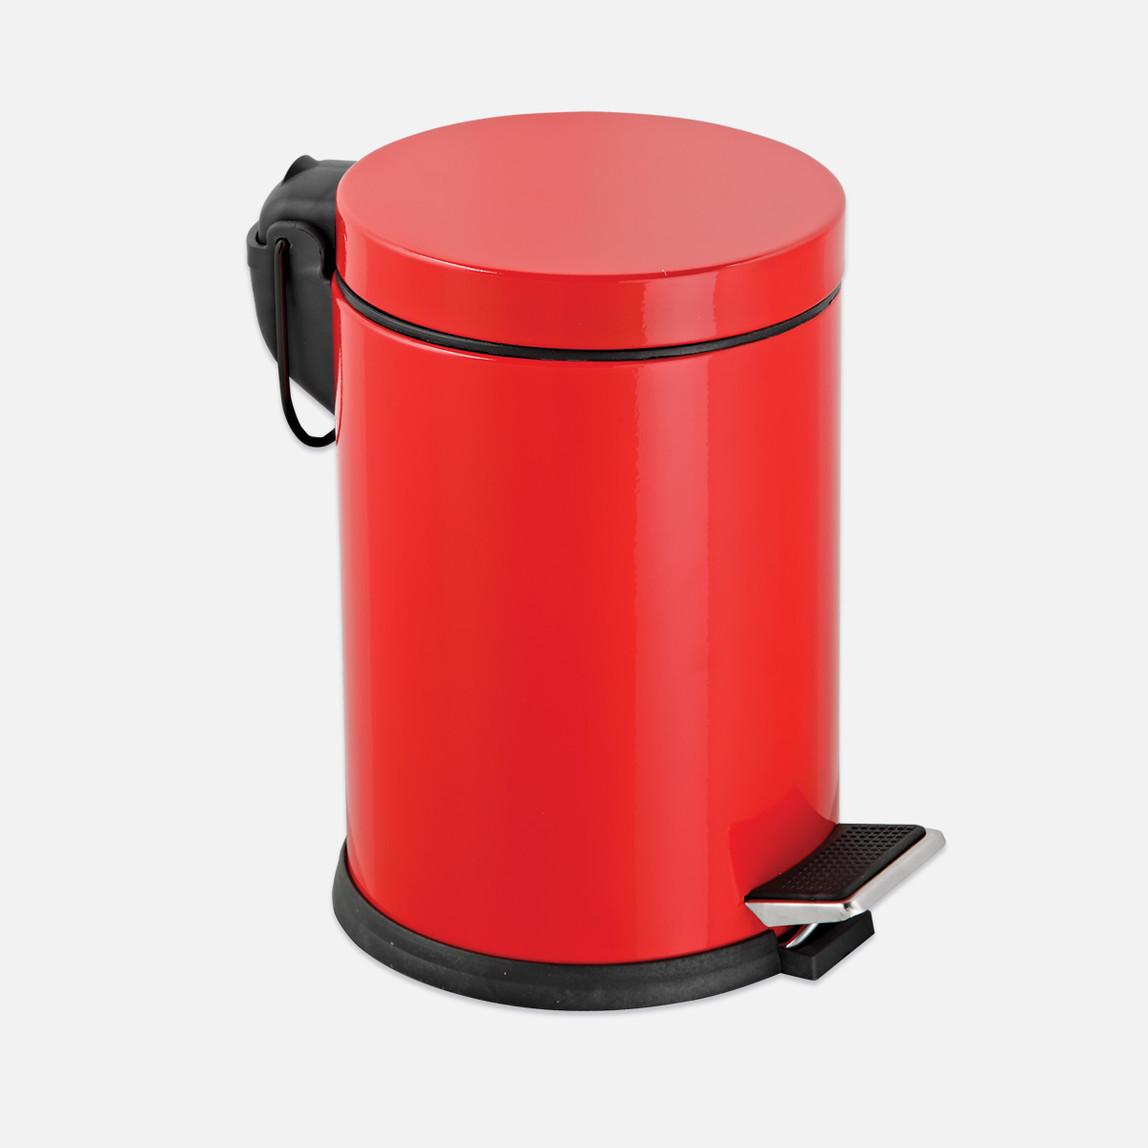 5Lt Pedallı Çöp Kovası, kırmızı